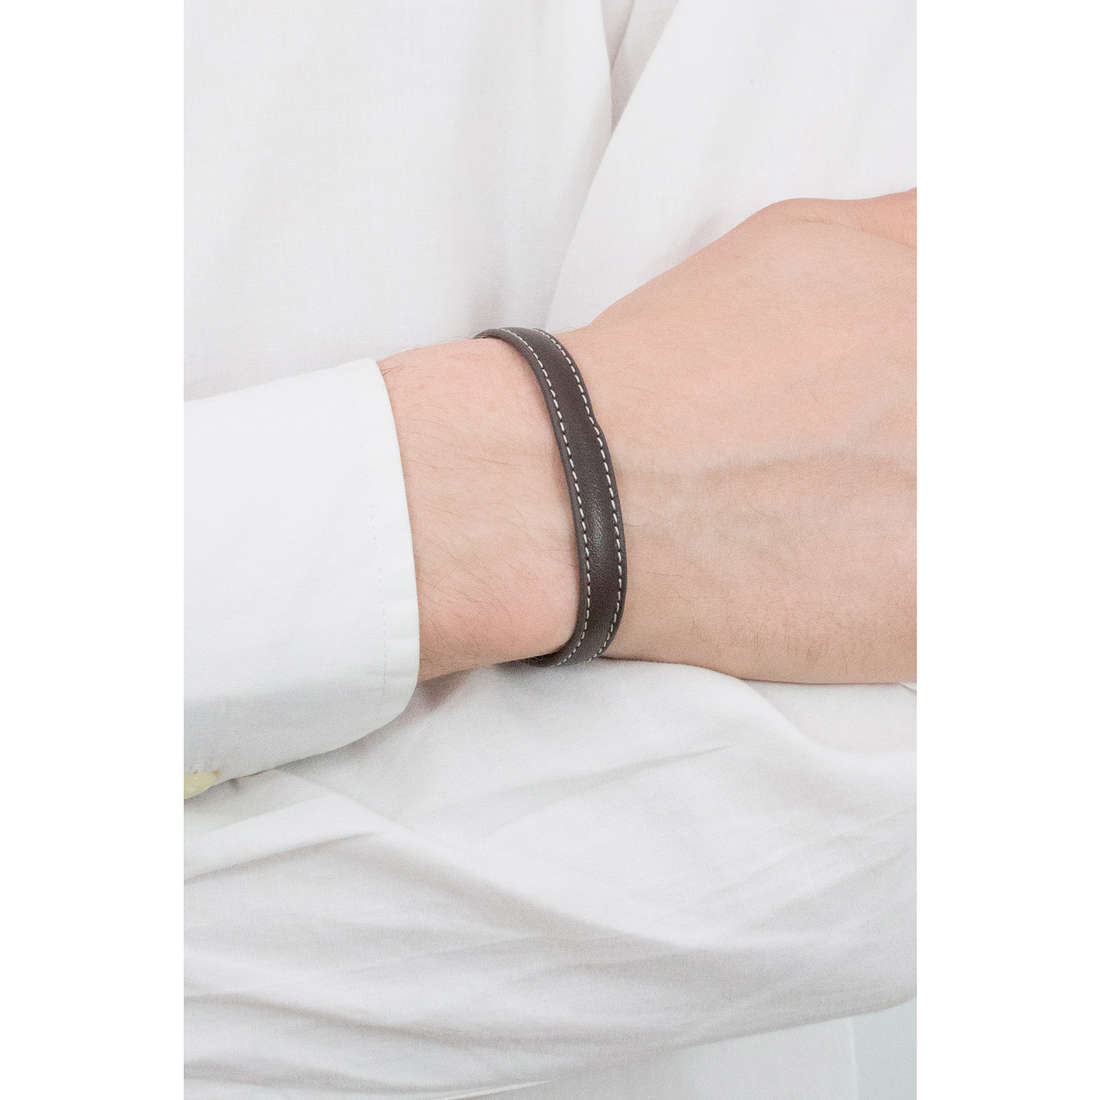 Luca Barra bracelets Sailor man LBBA818 photo wearing